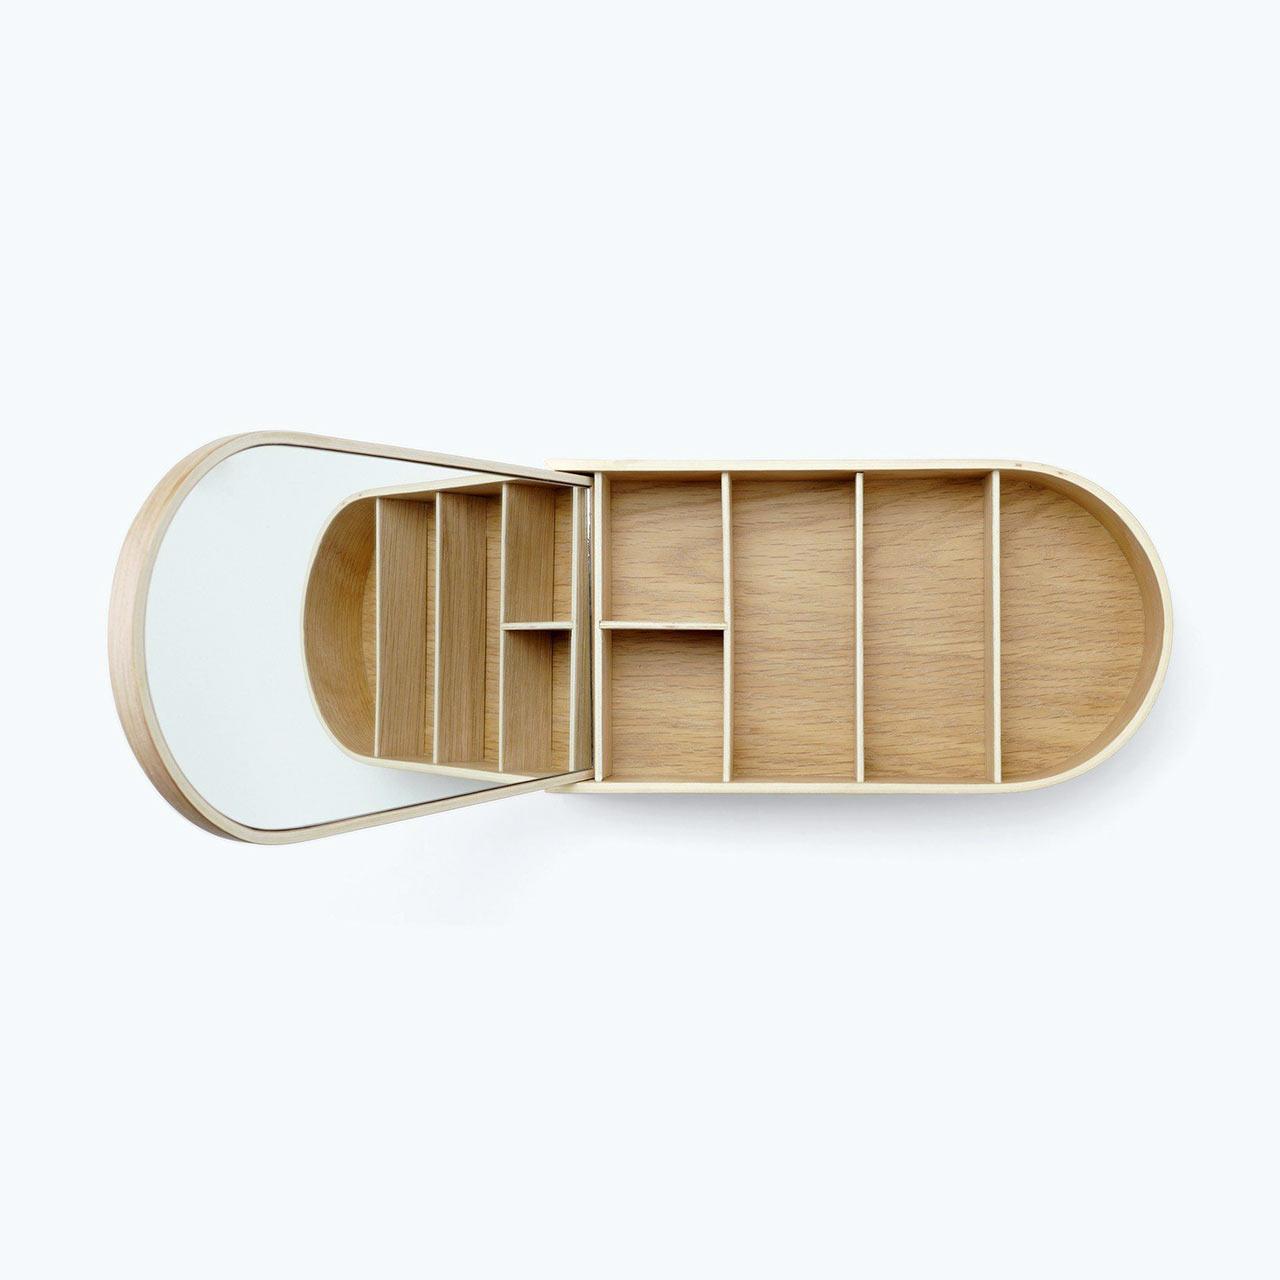 Menu jewellery box white oak | the design gift shop